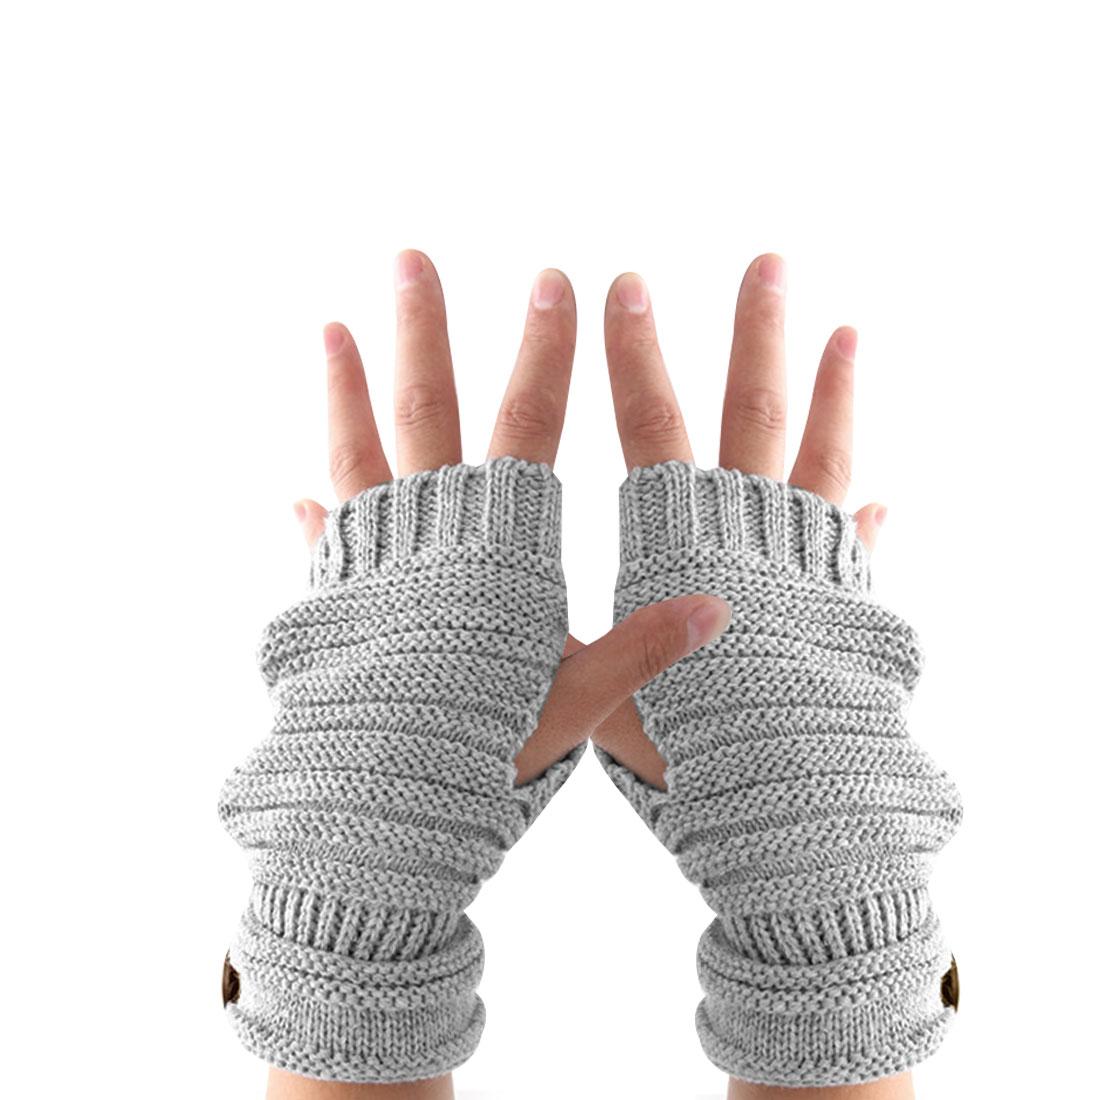 Unisex Light Gray Textured Fingerless Thumb Hole Button Decor Warm Gloves